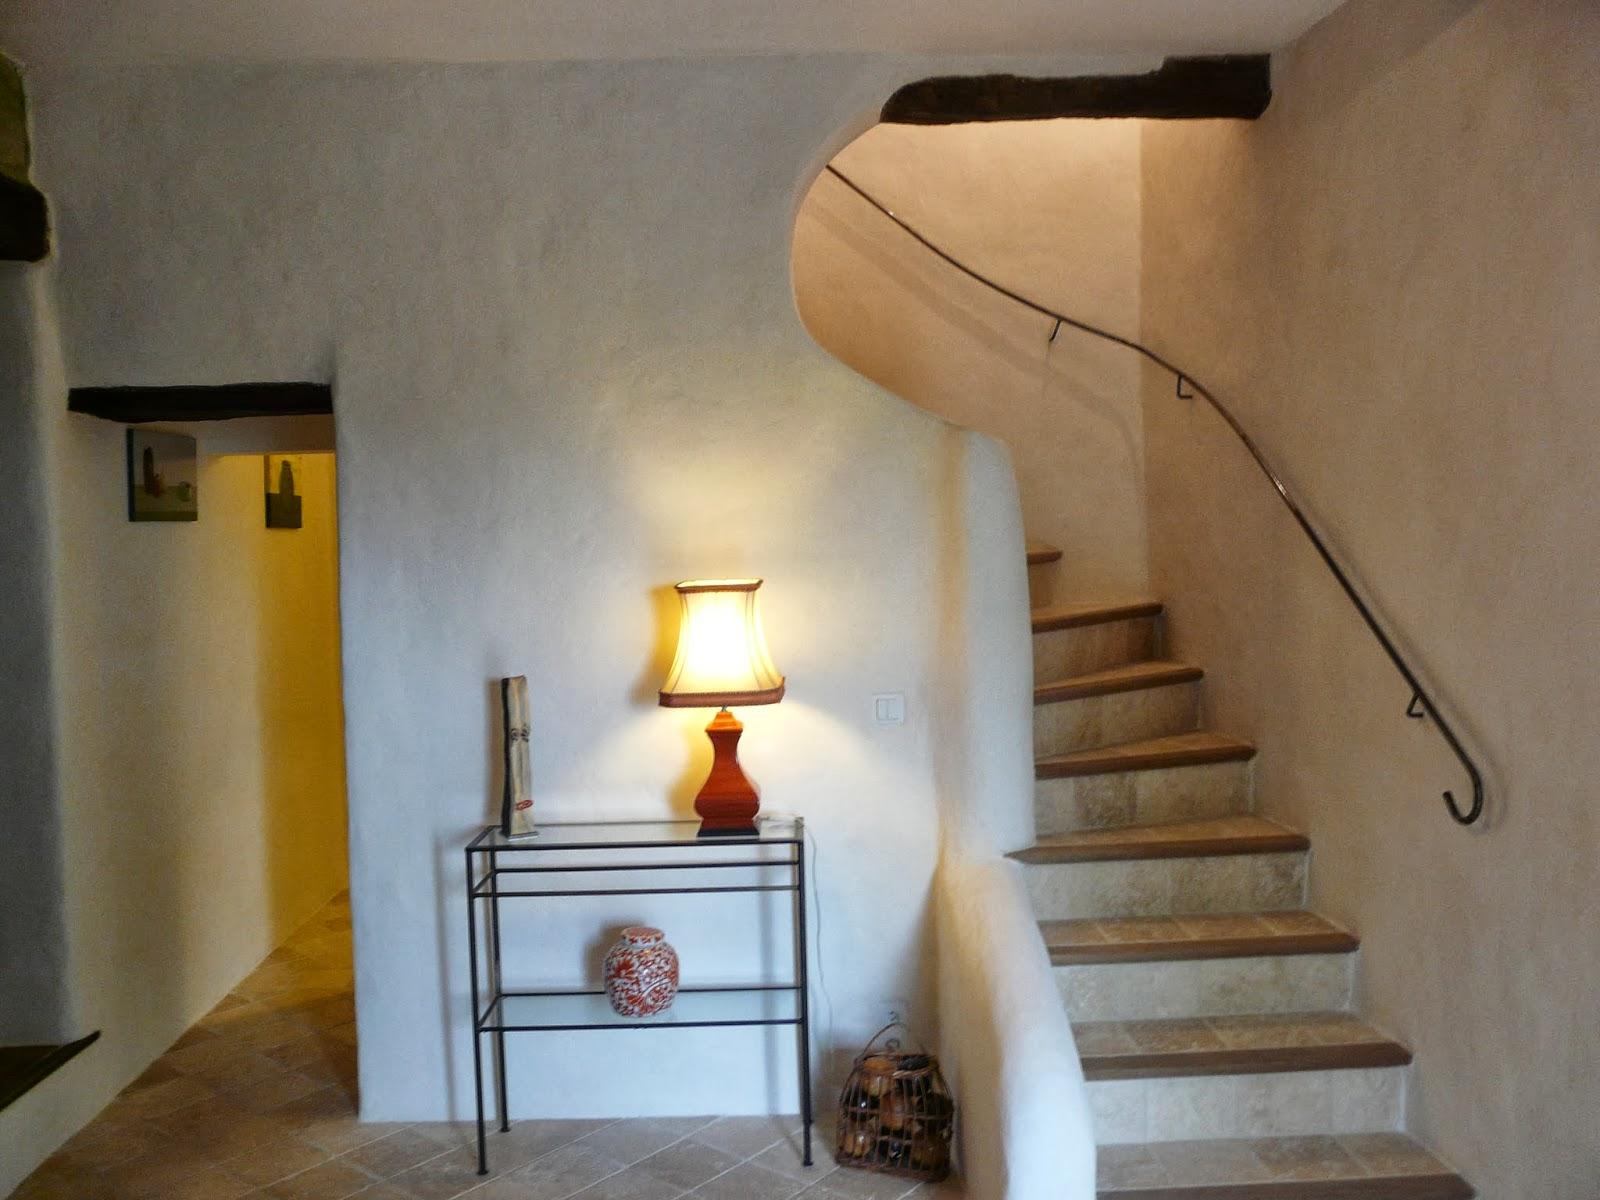 enduit de finition. Black Bedroom Furniture Sets. Home Design Ideas